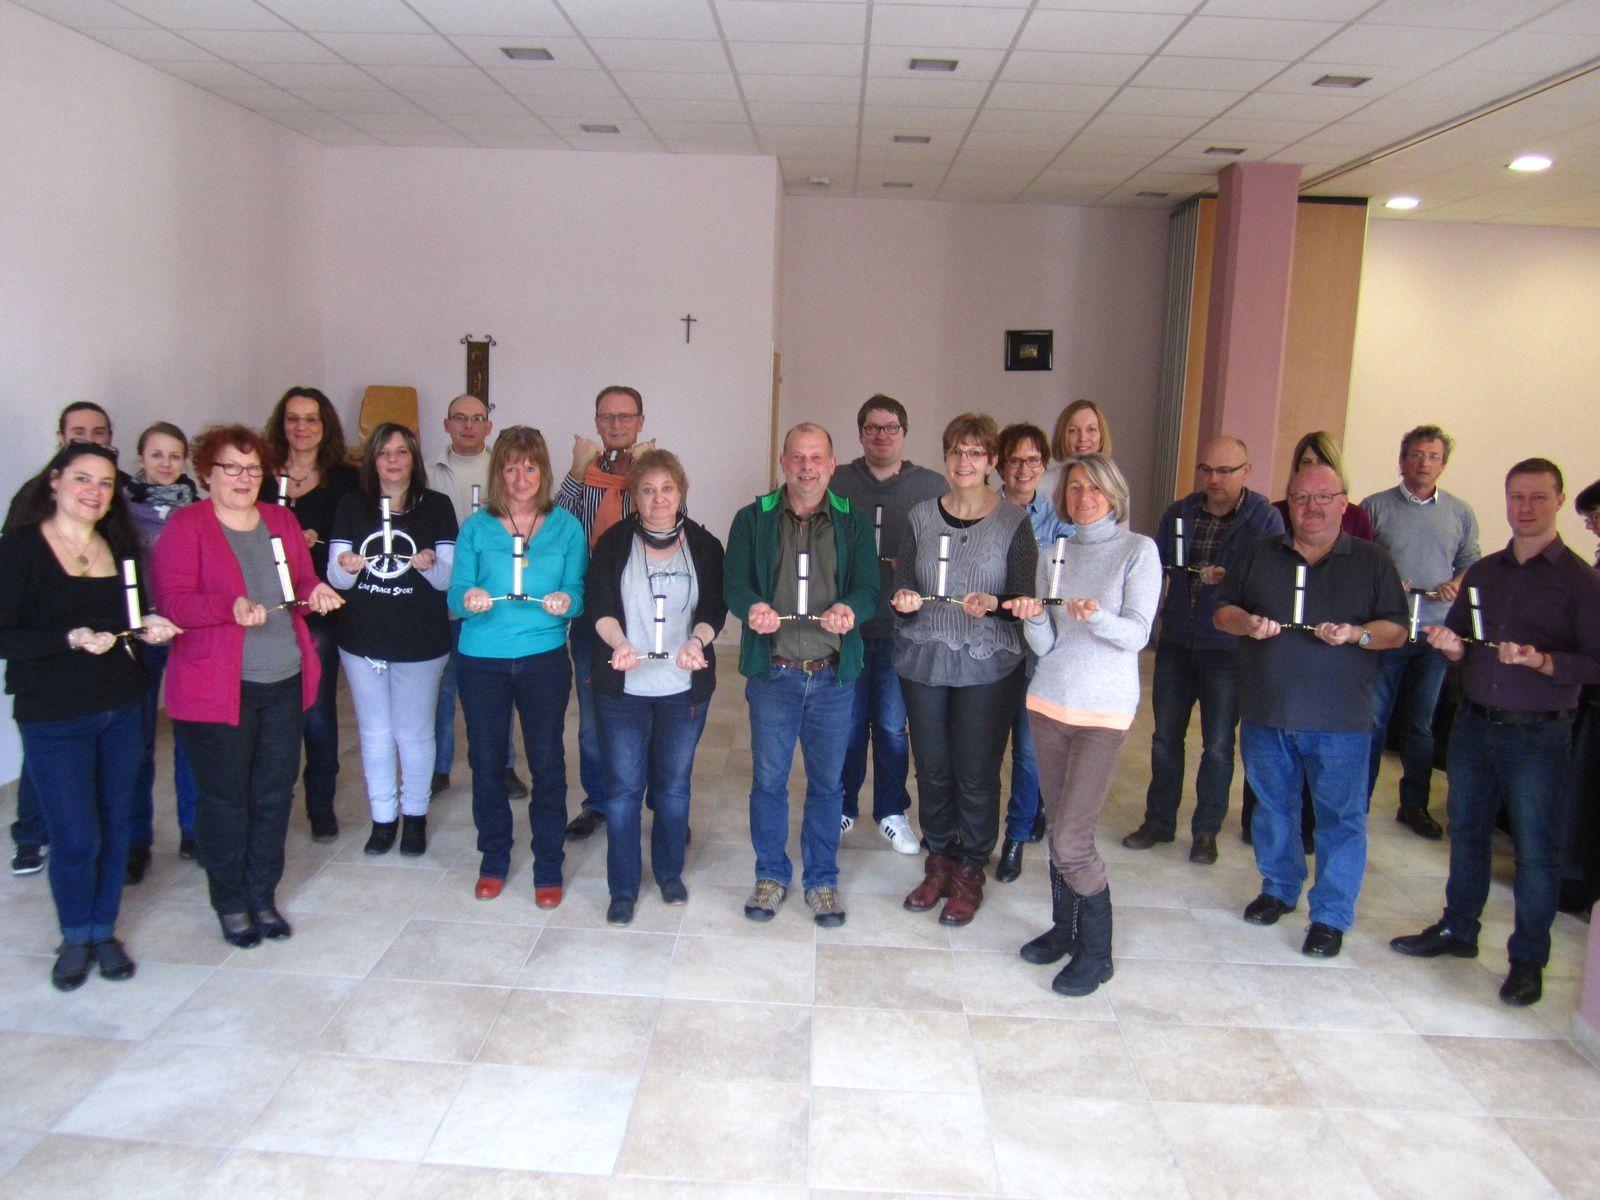 Formation geobiologie Arlon. Belgique Antenne Lecher Dim. 28 fevrier 2016